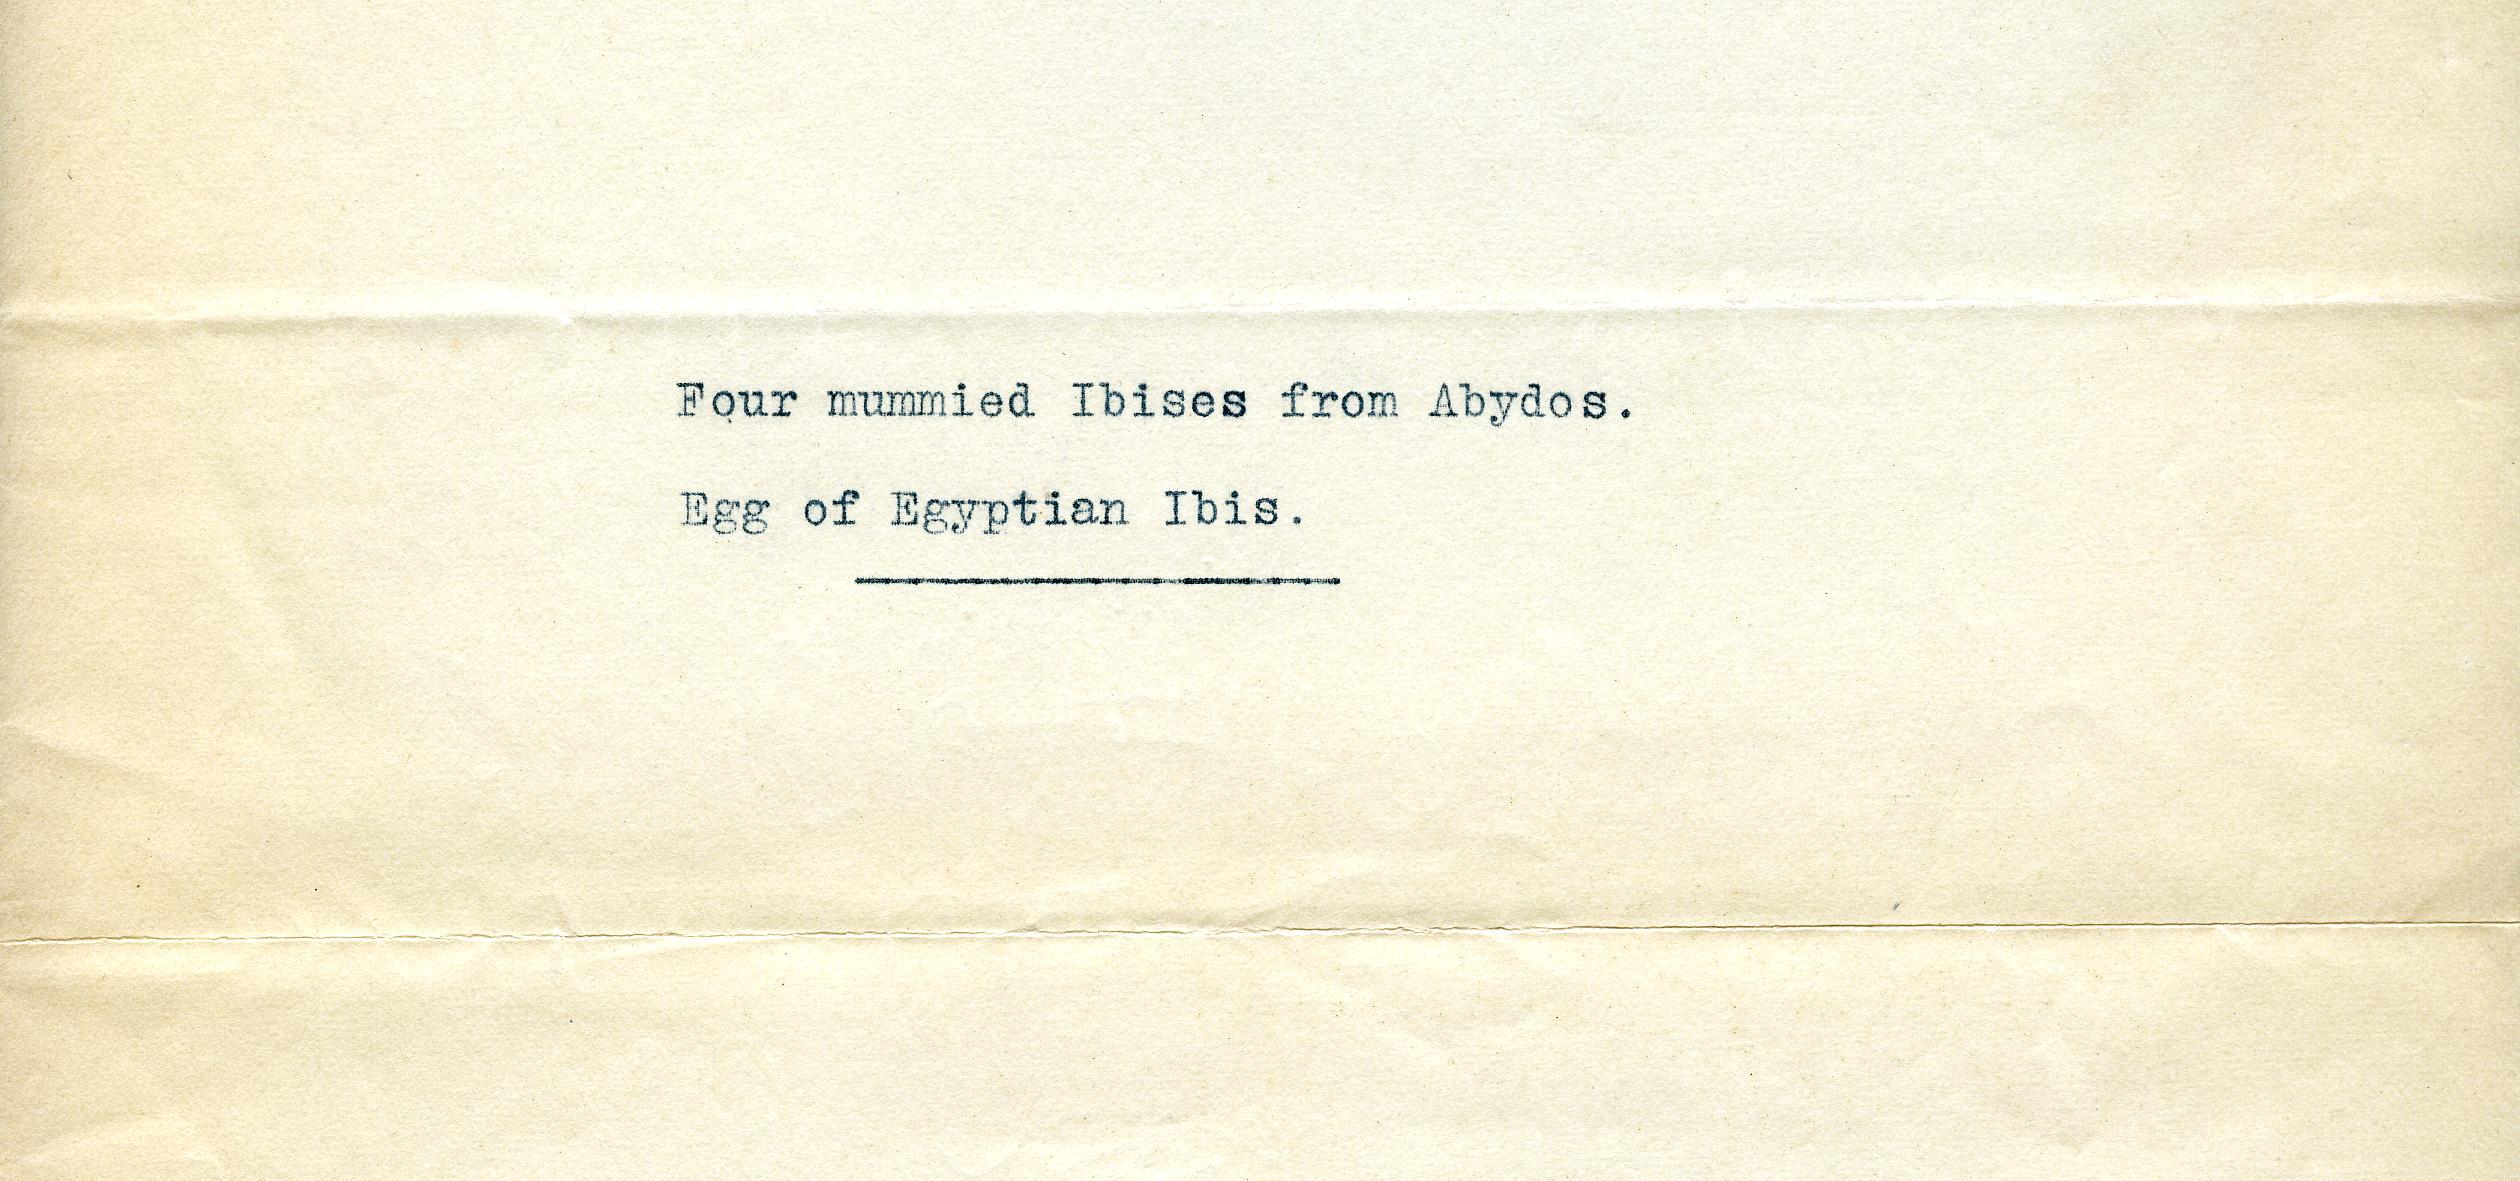 1912-13 Abydos etc DIST.35.02b